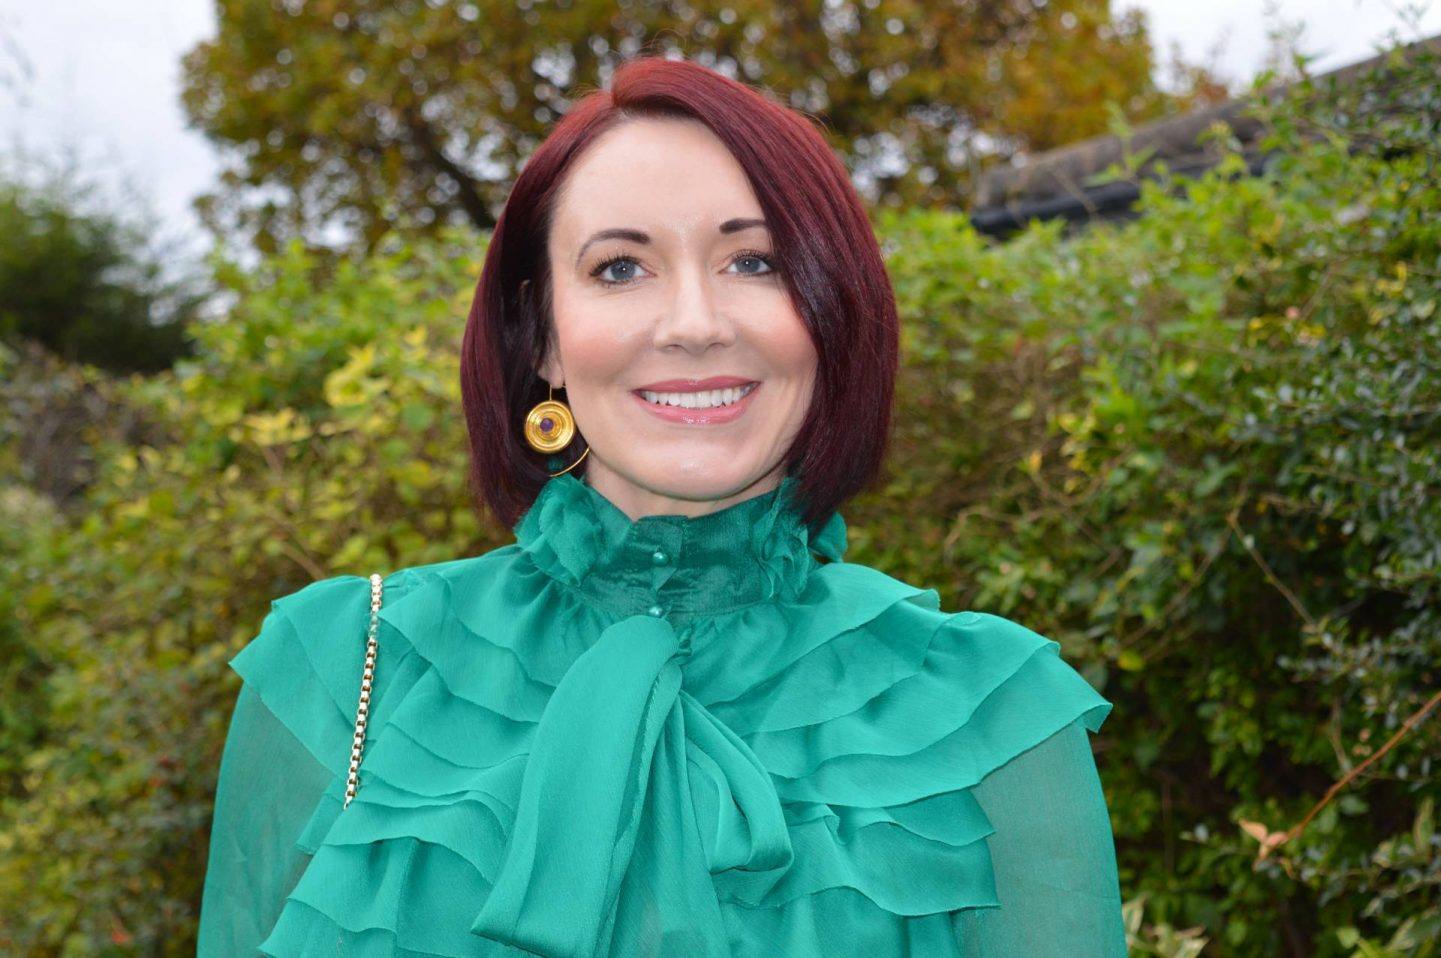 Little Mistress green sheer ruffle blouse, Ottoman Hands gold and amethyst disc earrings